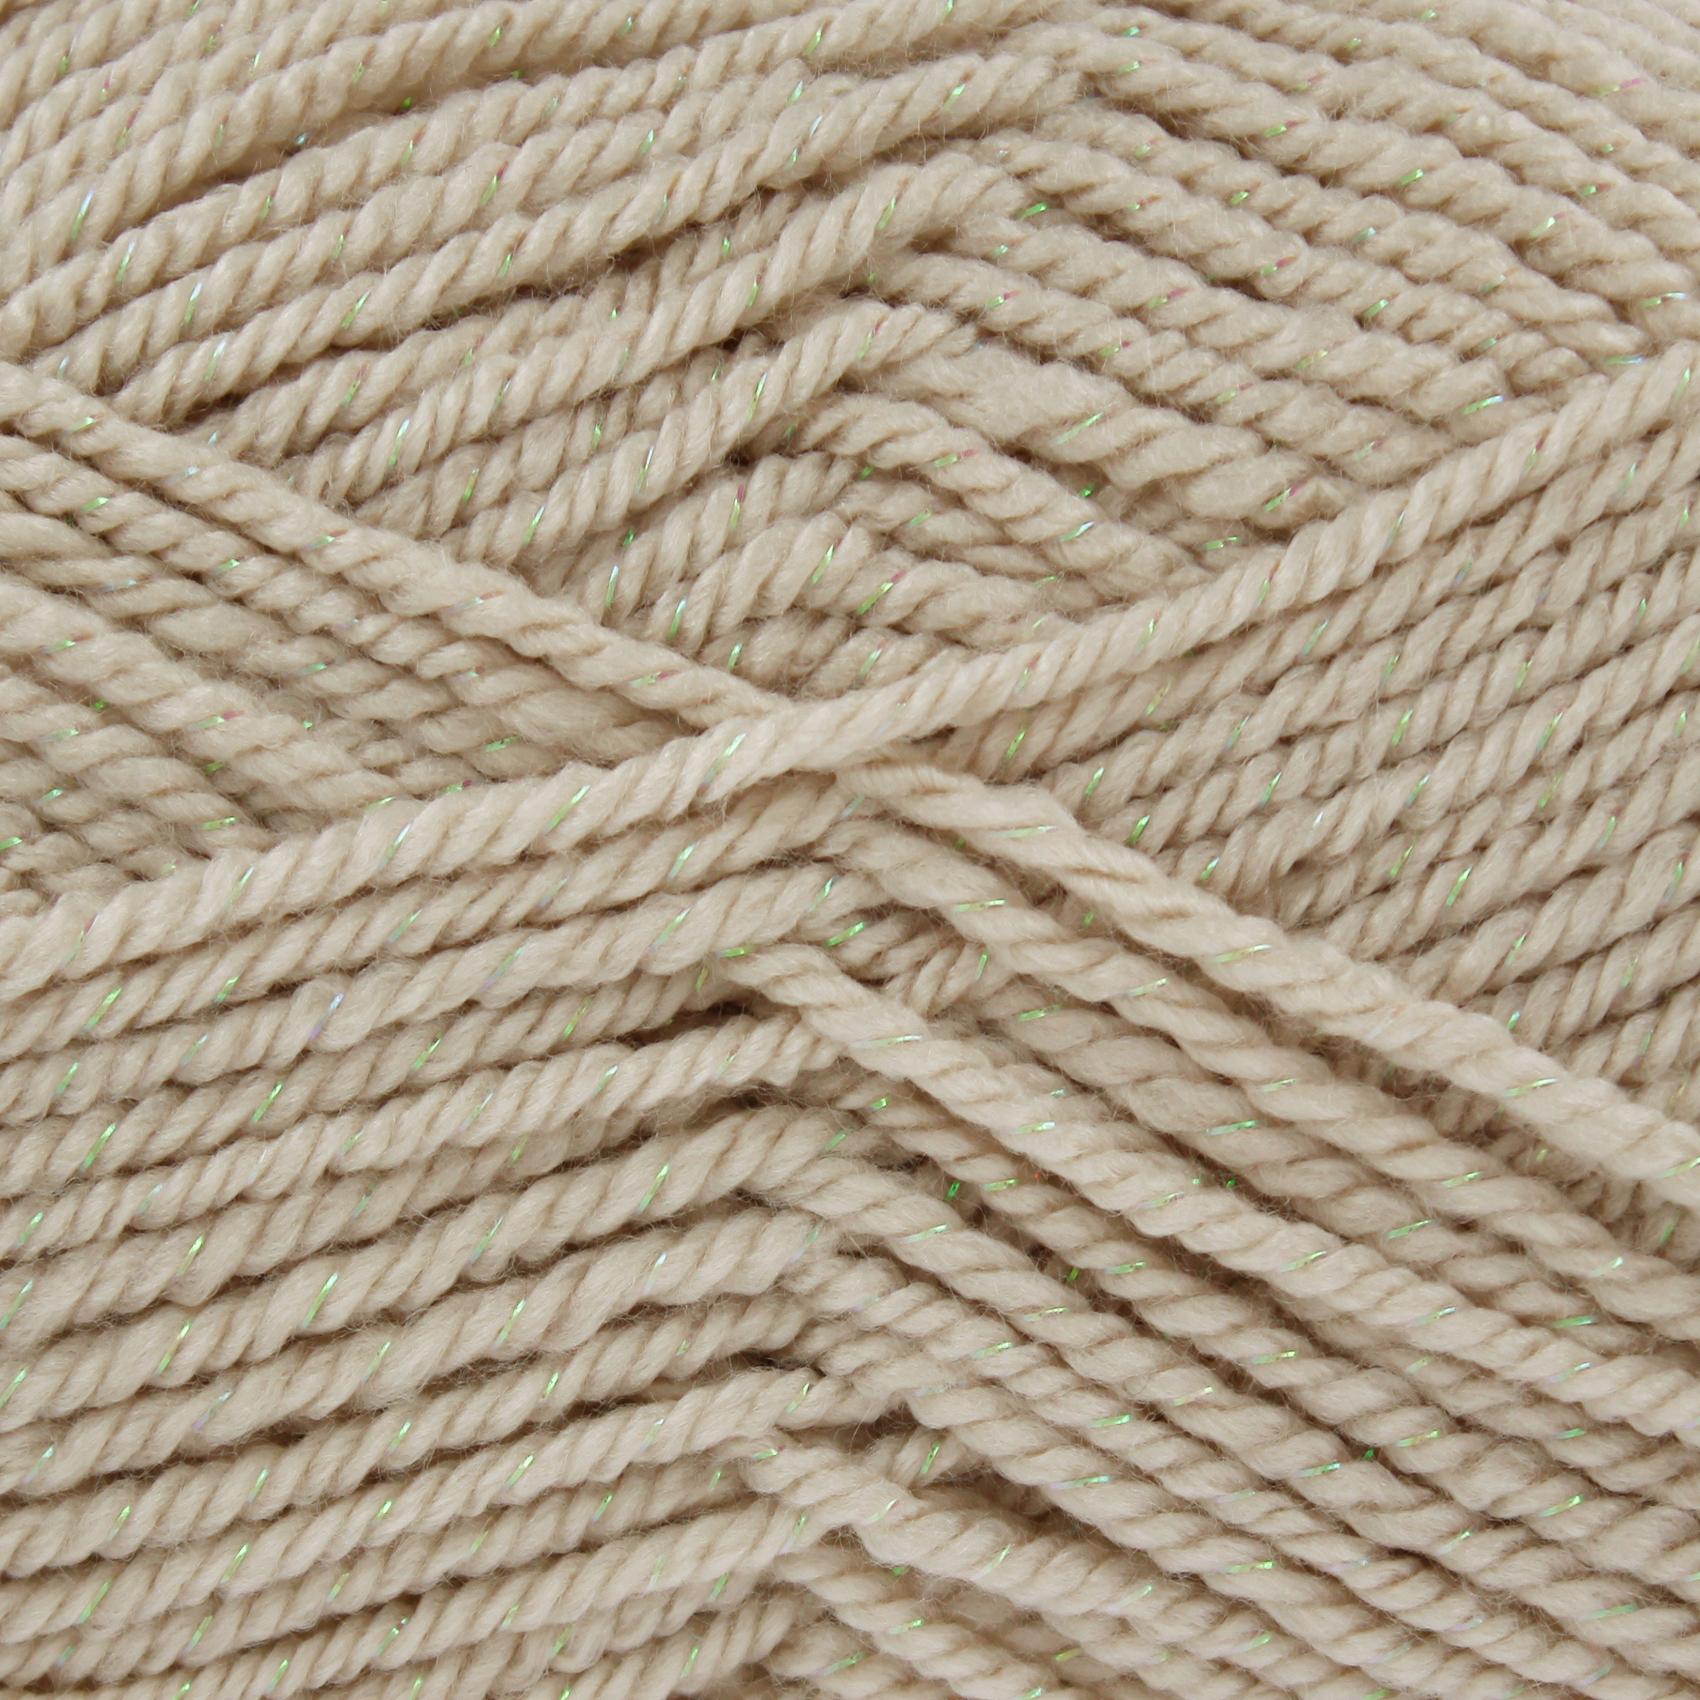 100g King Cole Glitz Chunky Free Knitting Pattern Acrylic Sparkly ...